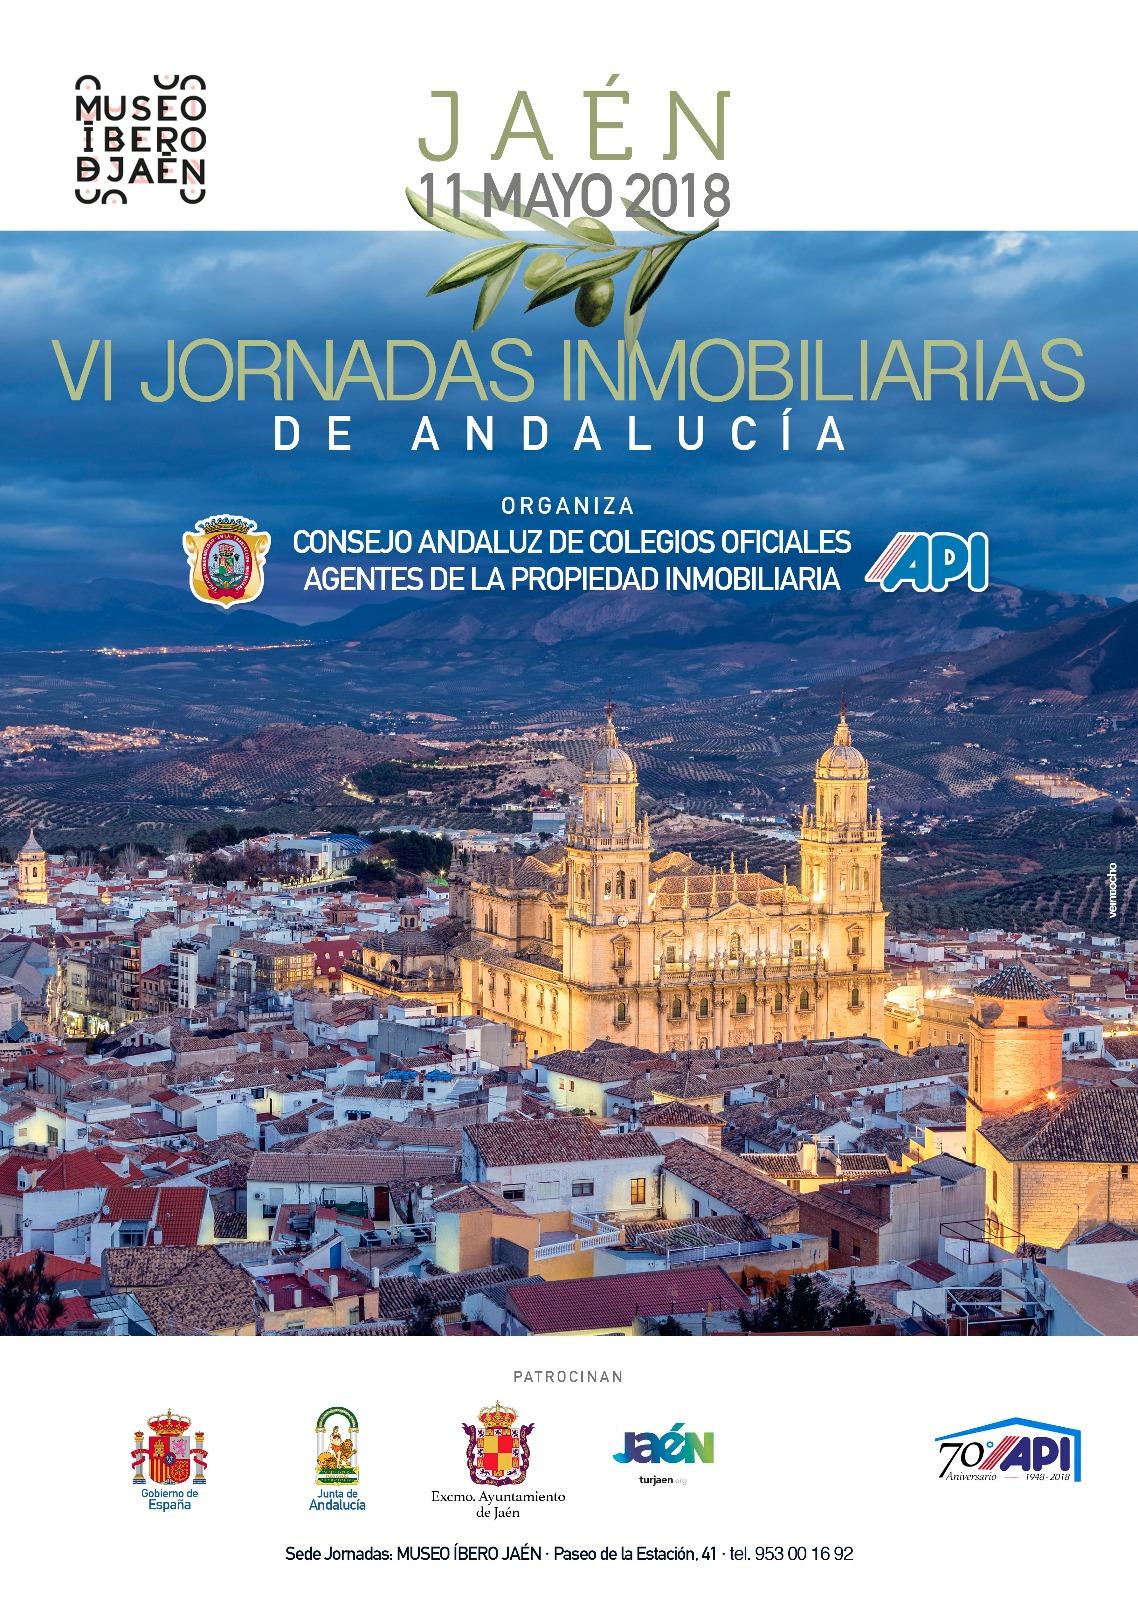 VI-JORNADAS-INMOBILIARIAS-DE-ANDALUCIA-JAEN-11-05-2018